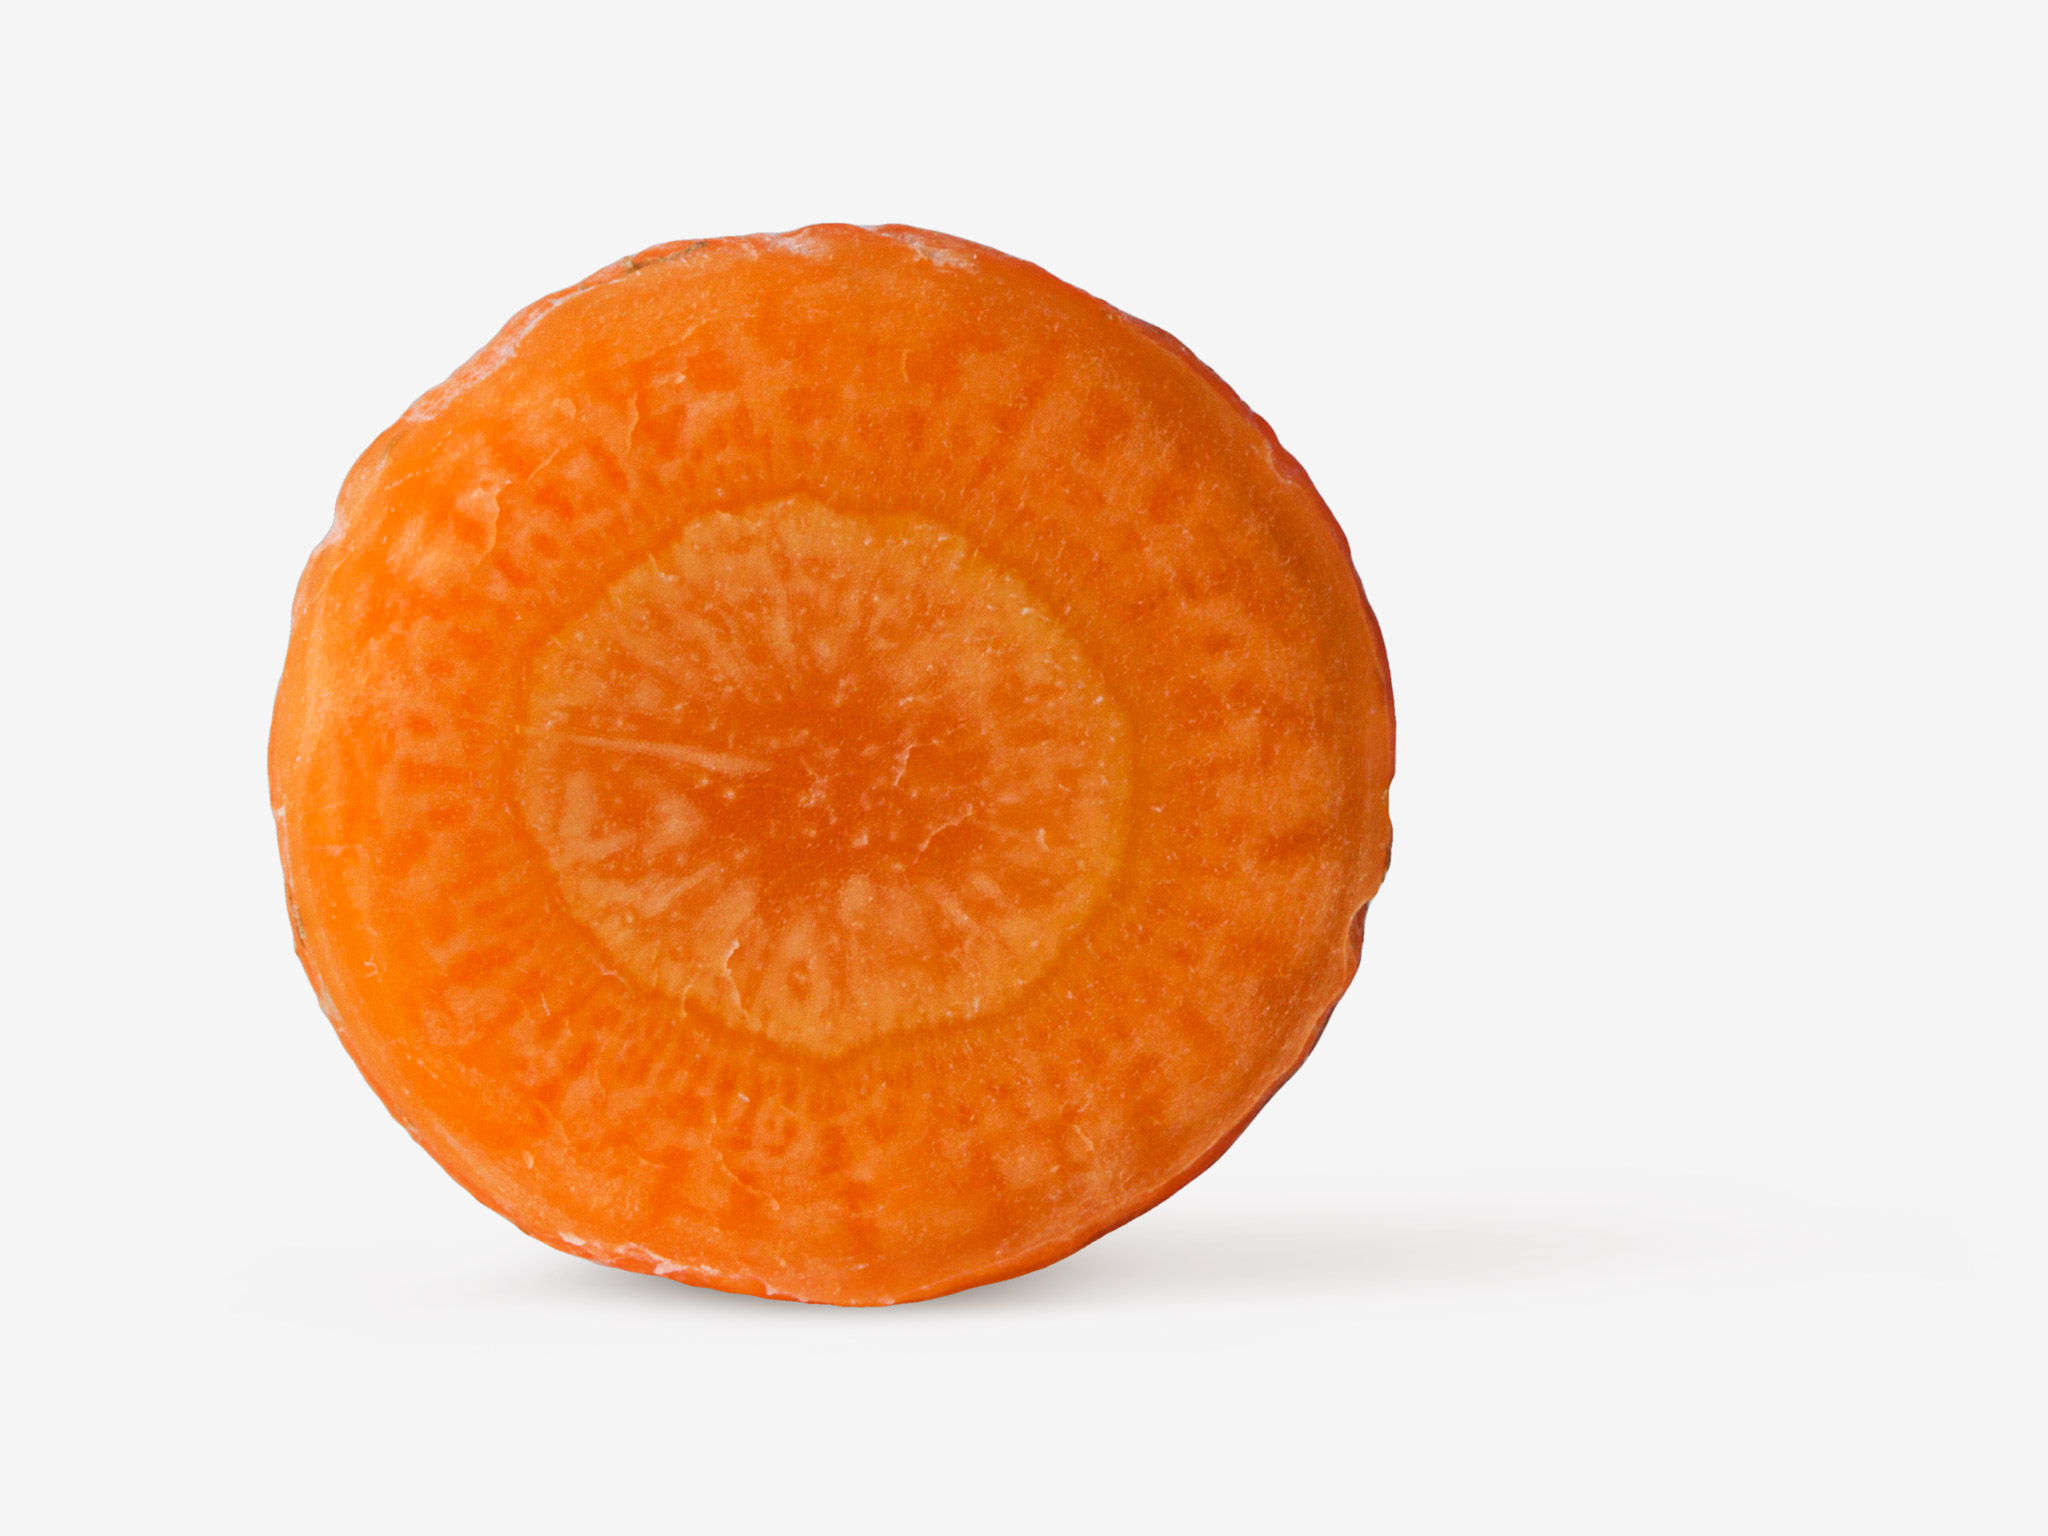 Orange PSD image with transparent background